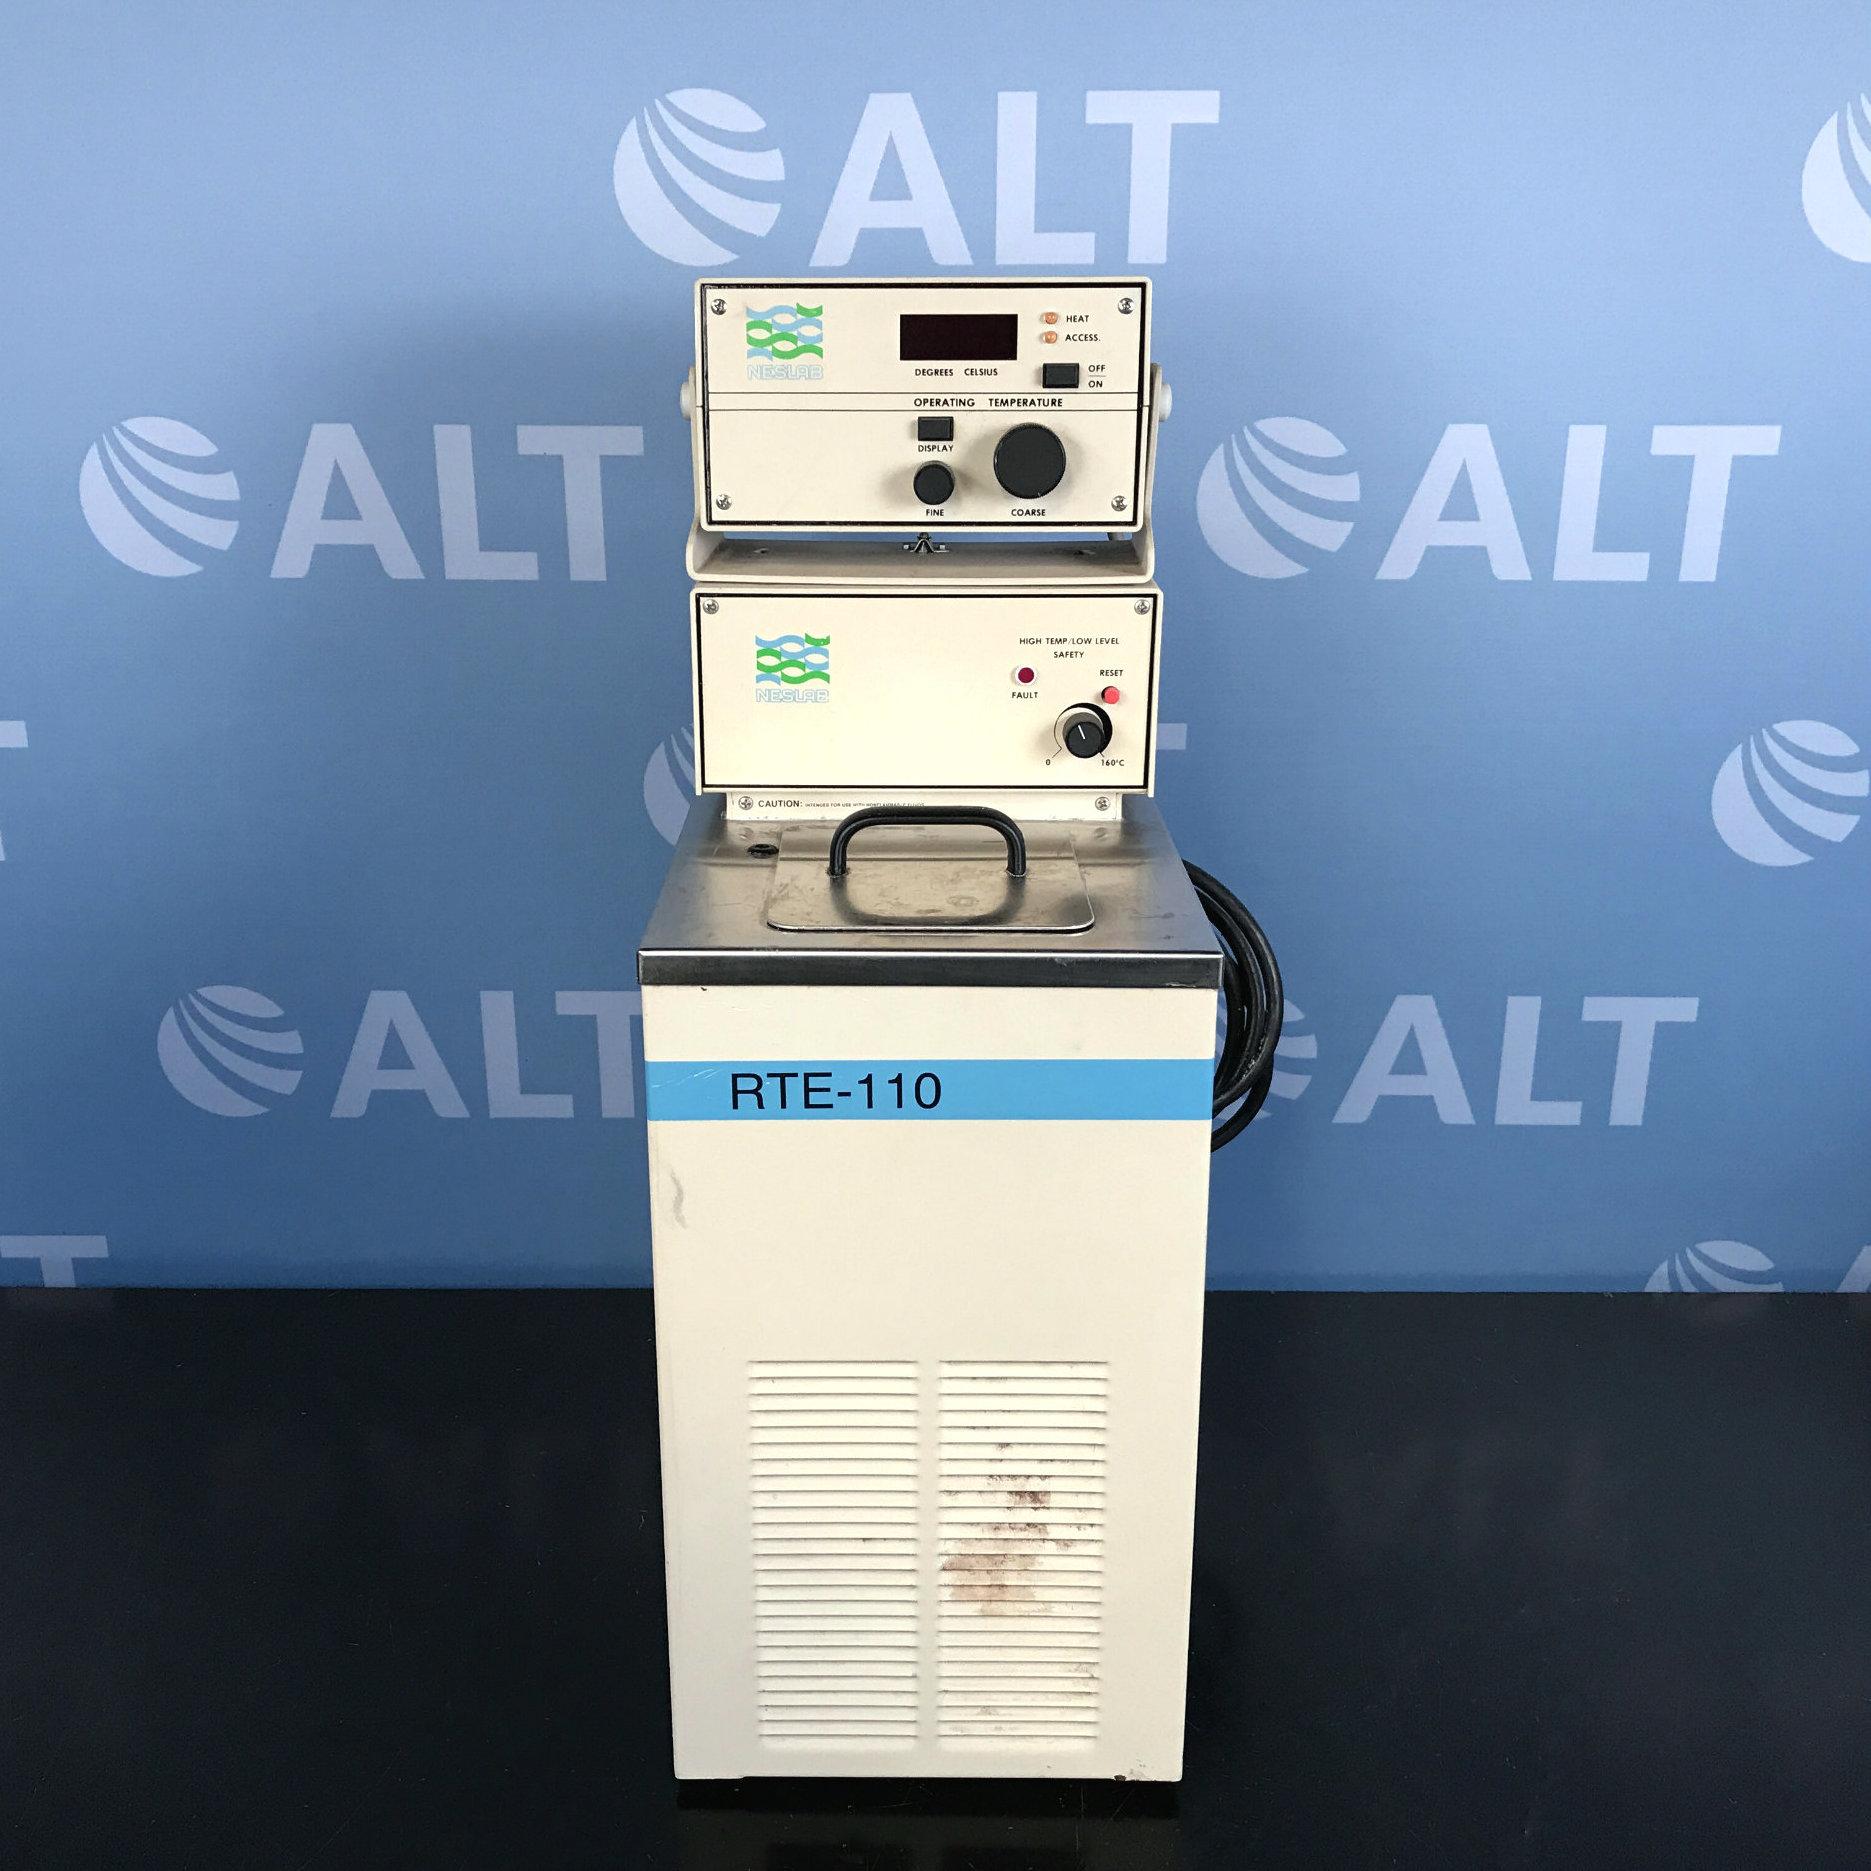 Neslab RTE-110 Refrigerated Recirculating Chiller Image